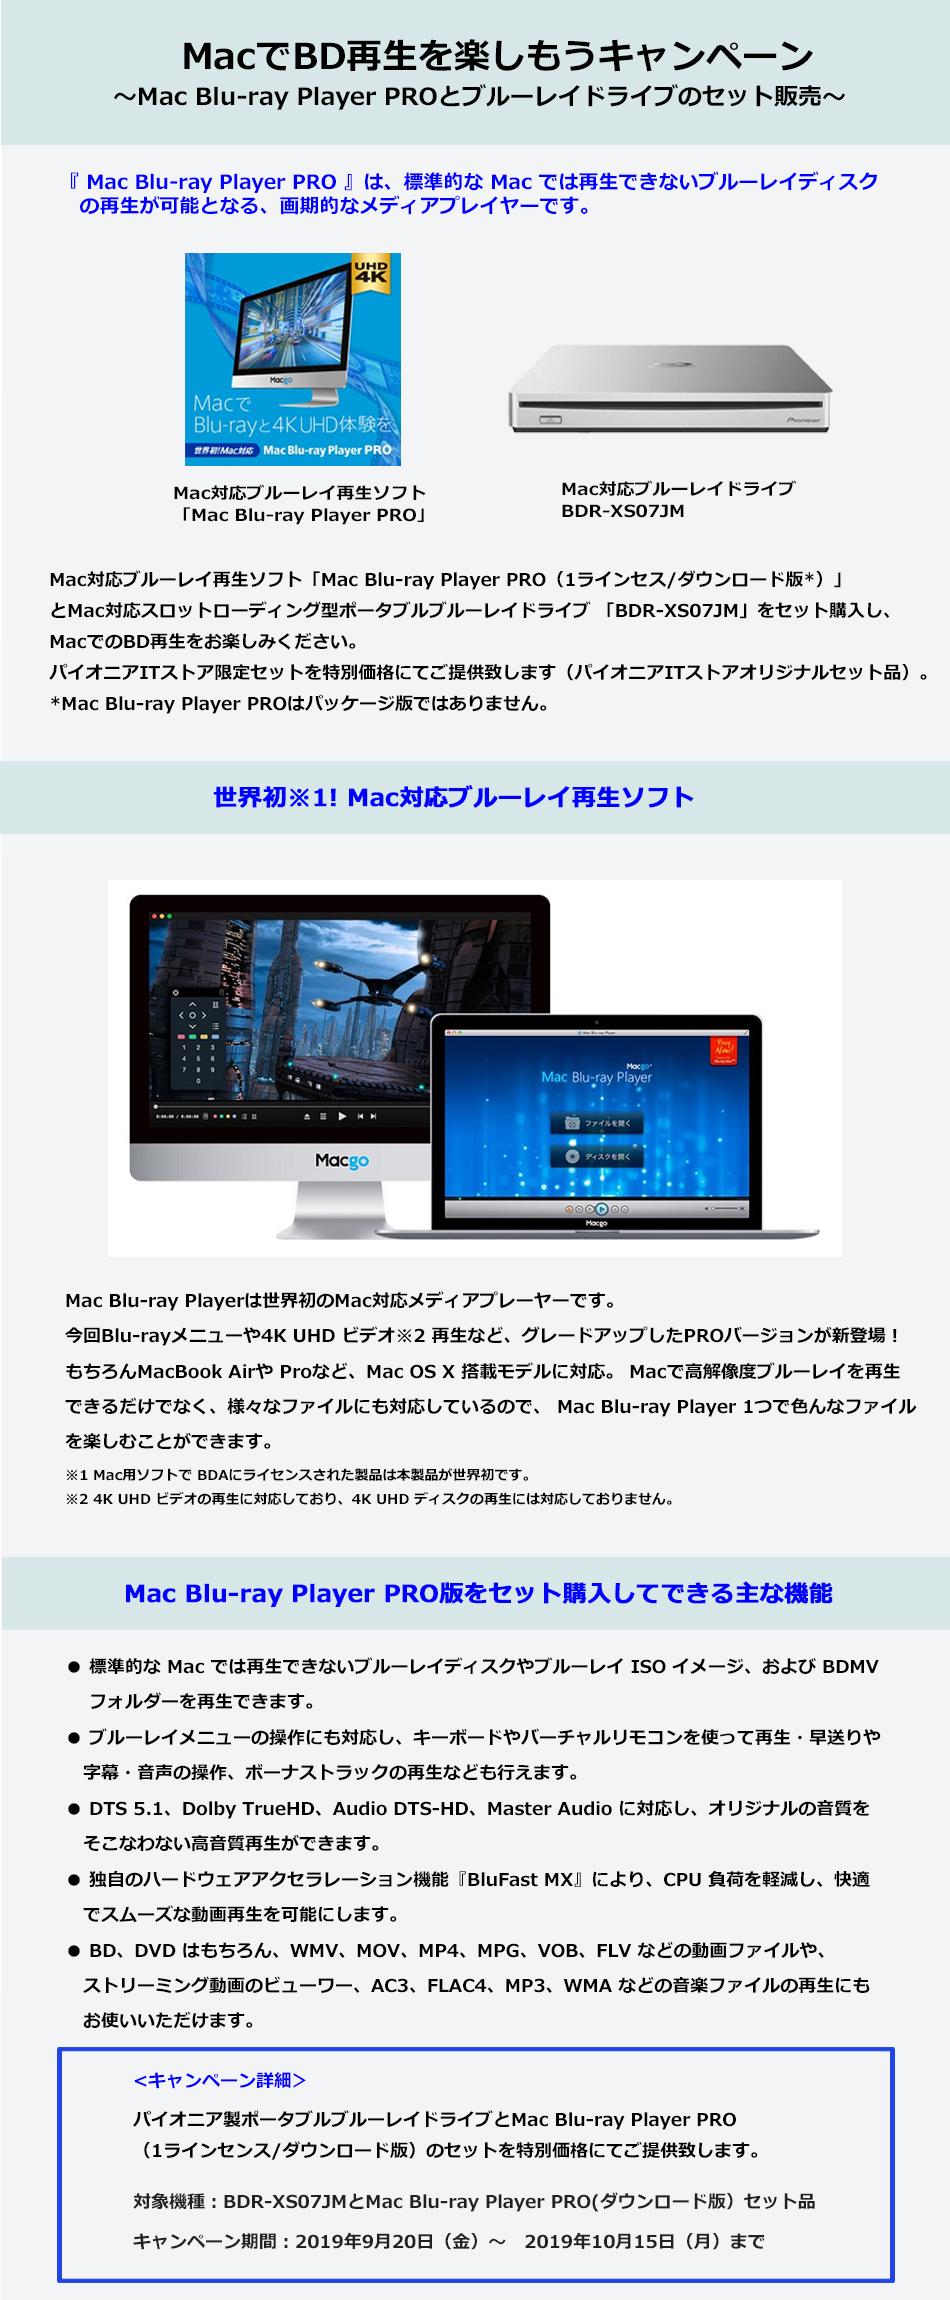 BDR-XS07JMとMac Blu-ray Player PROセットキャンペーン